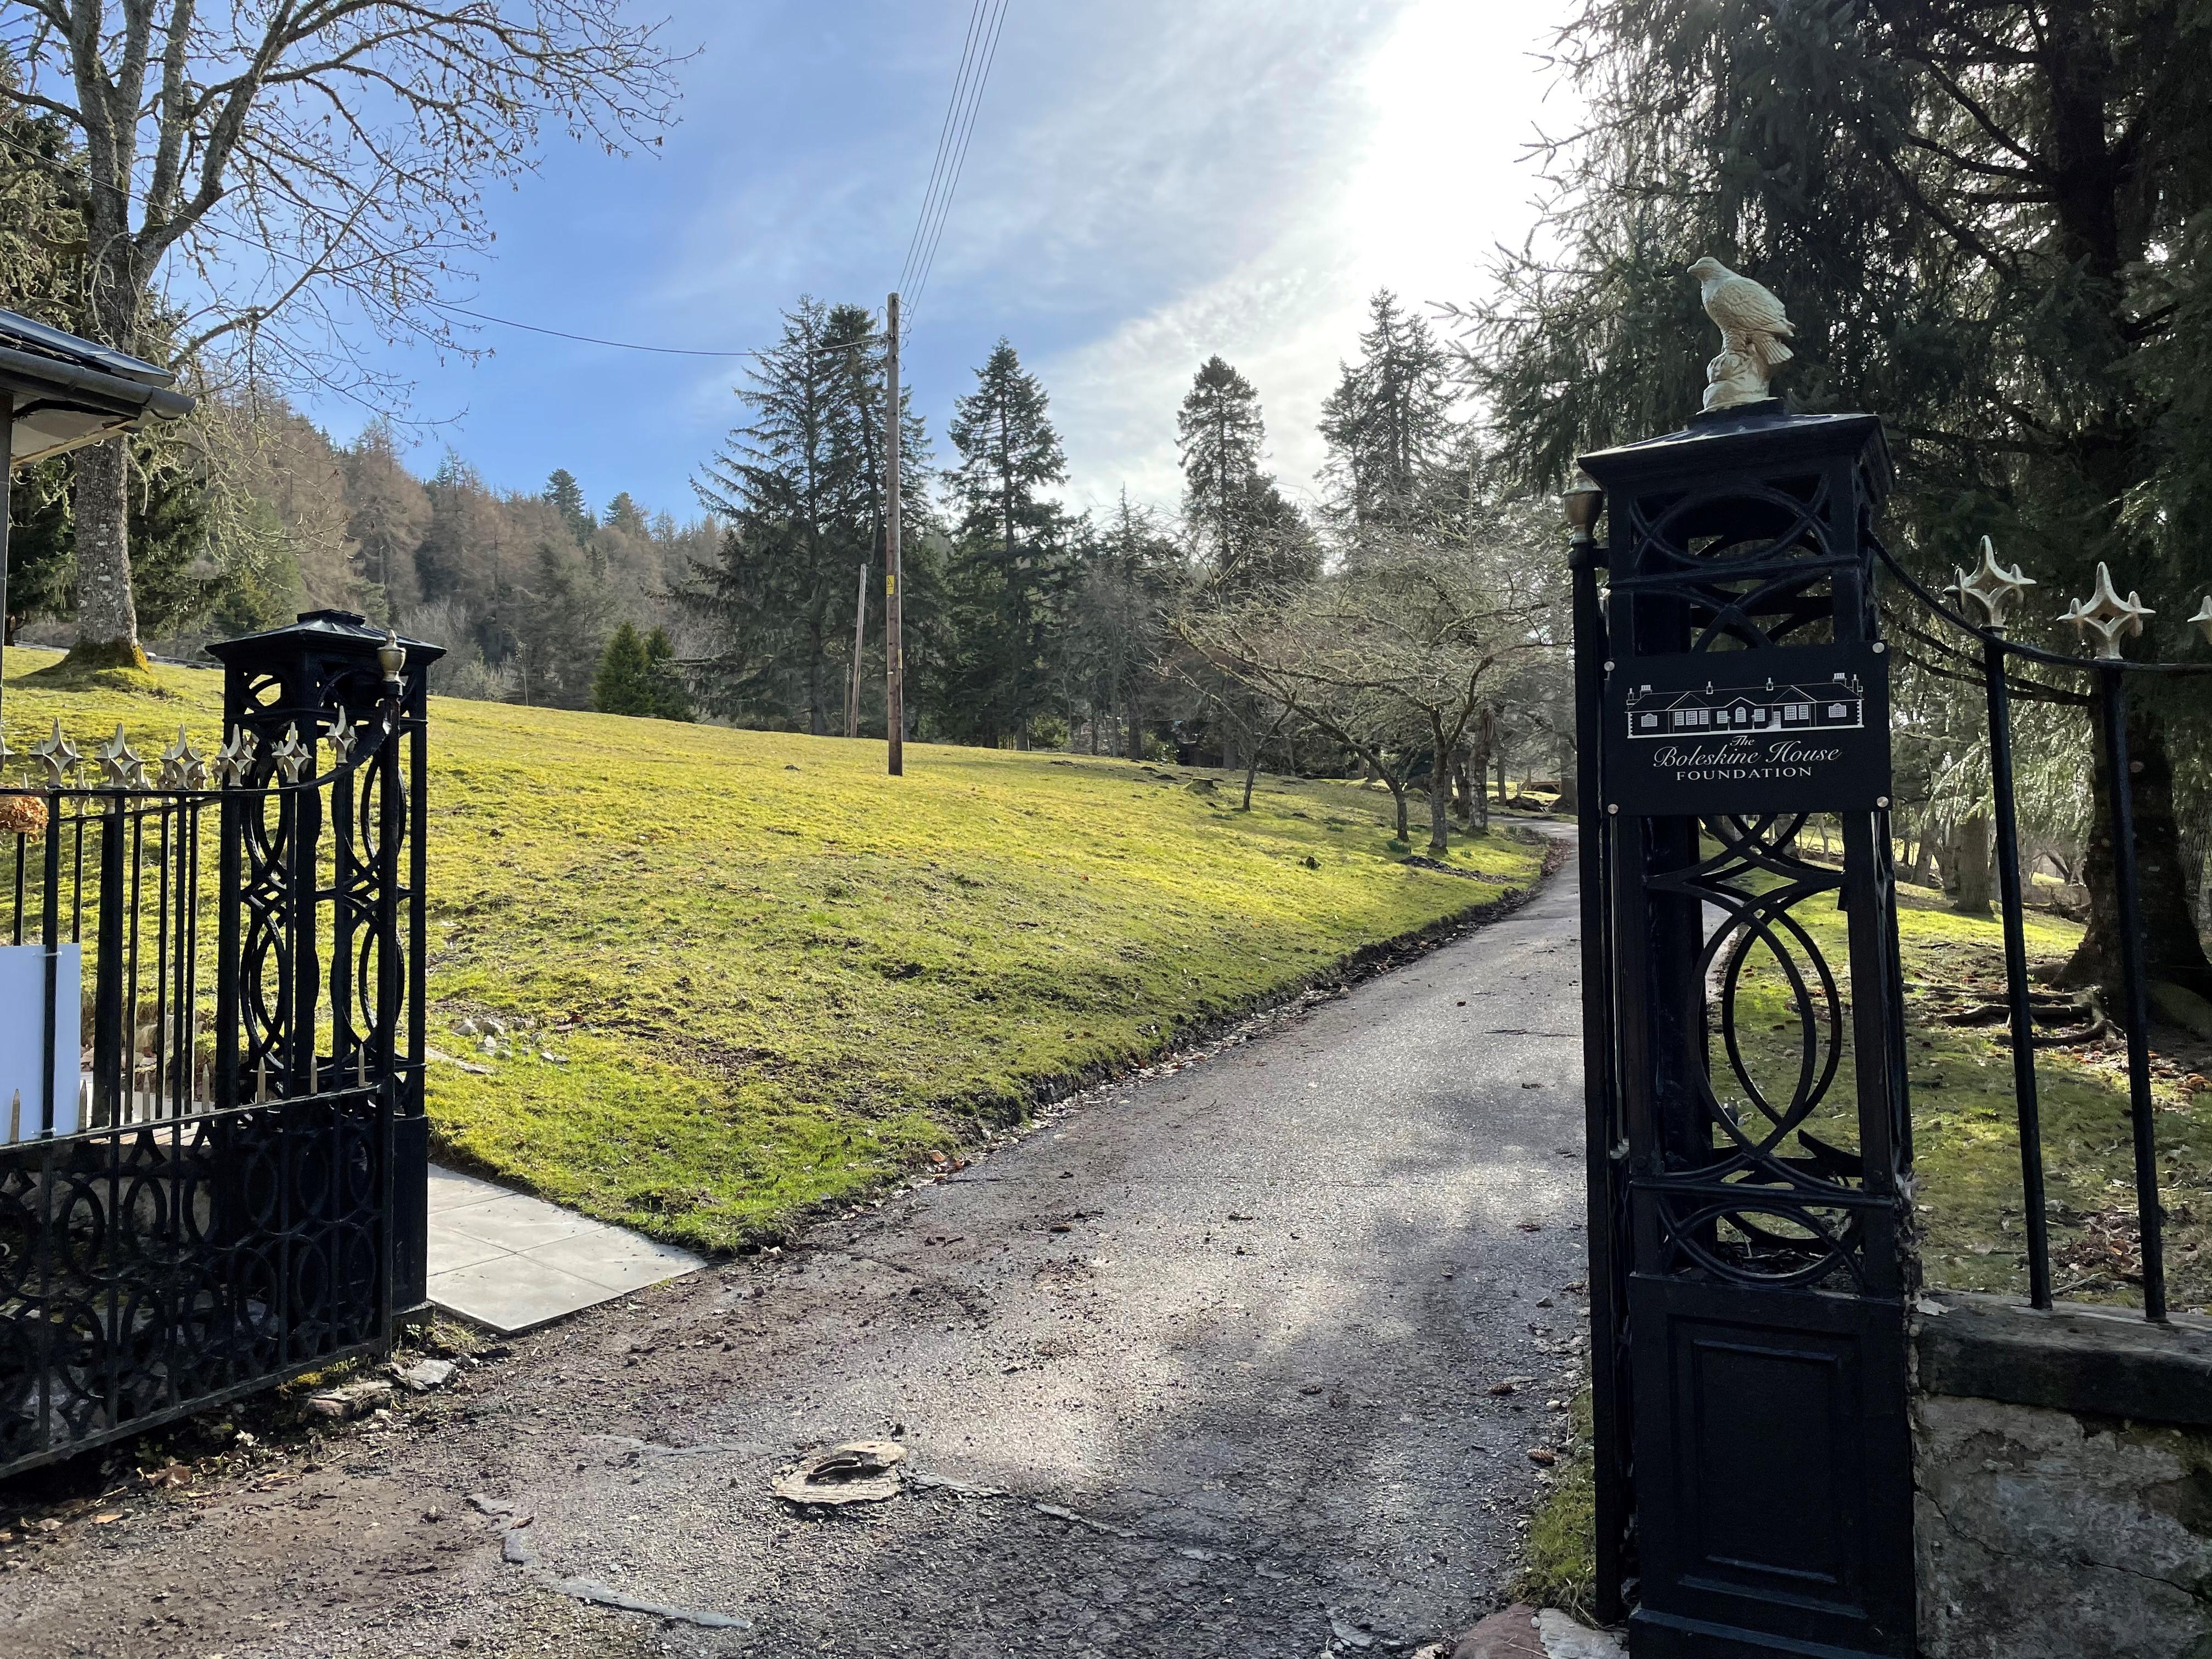 Boleskine Gates Loch Ness